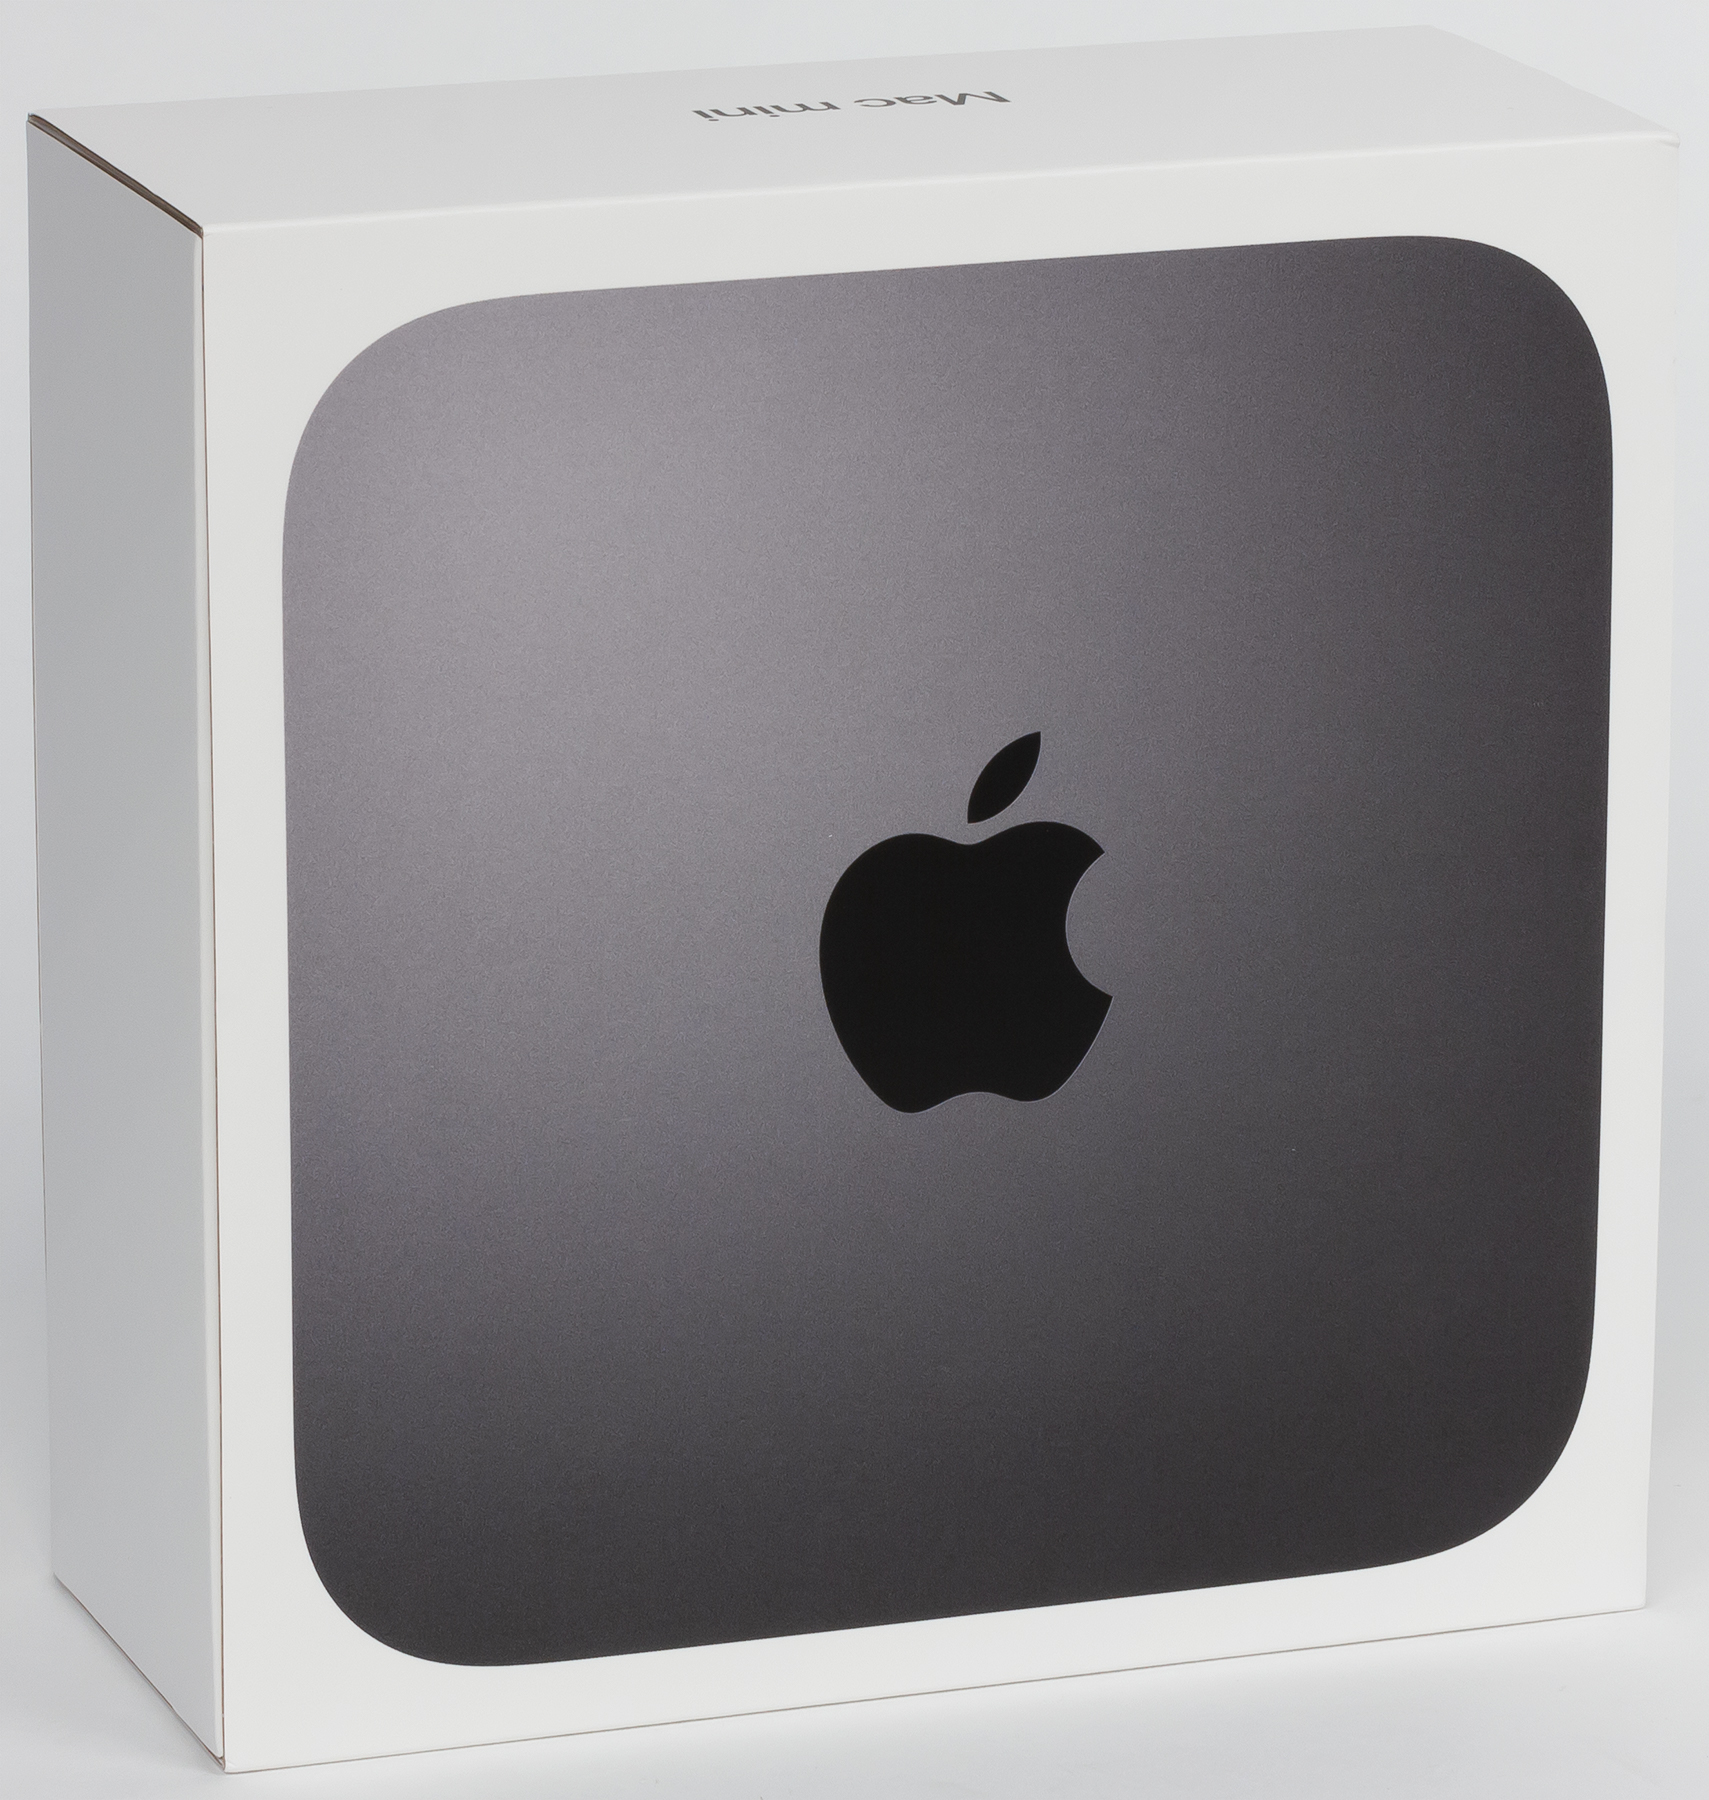 Mac mini and the Environment